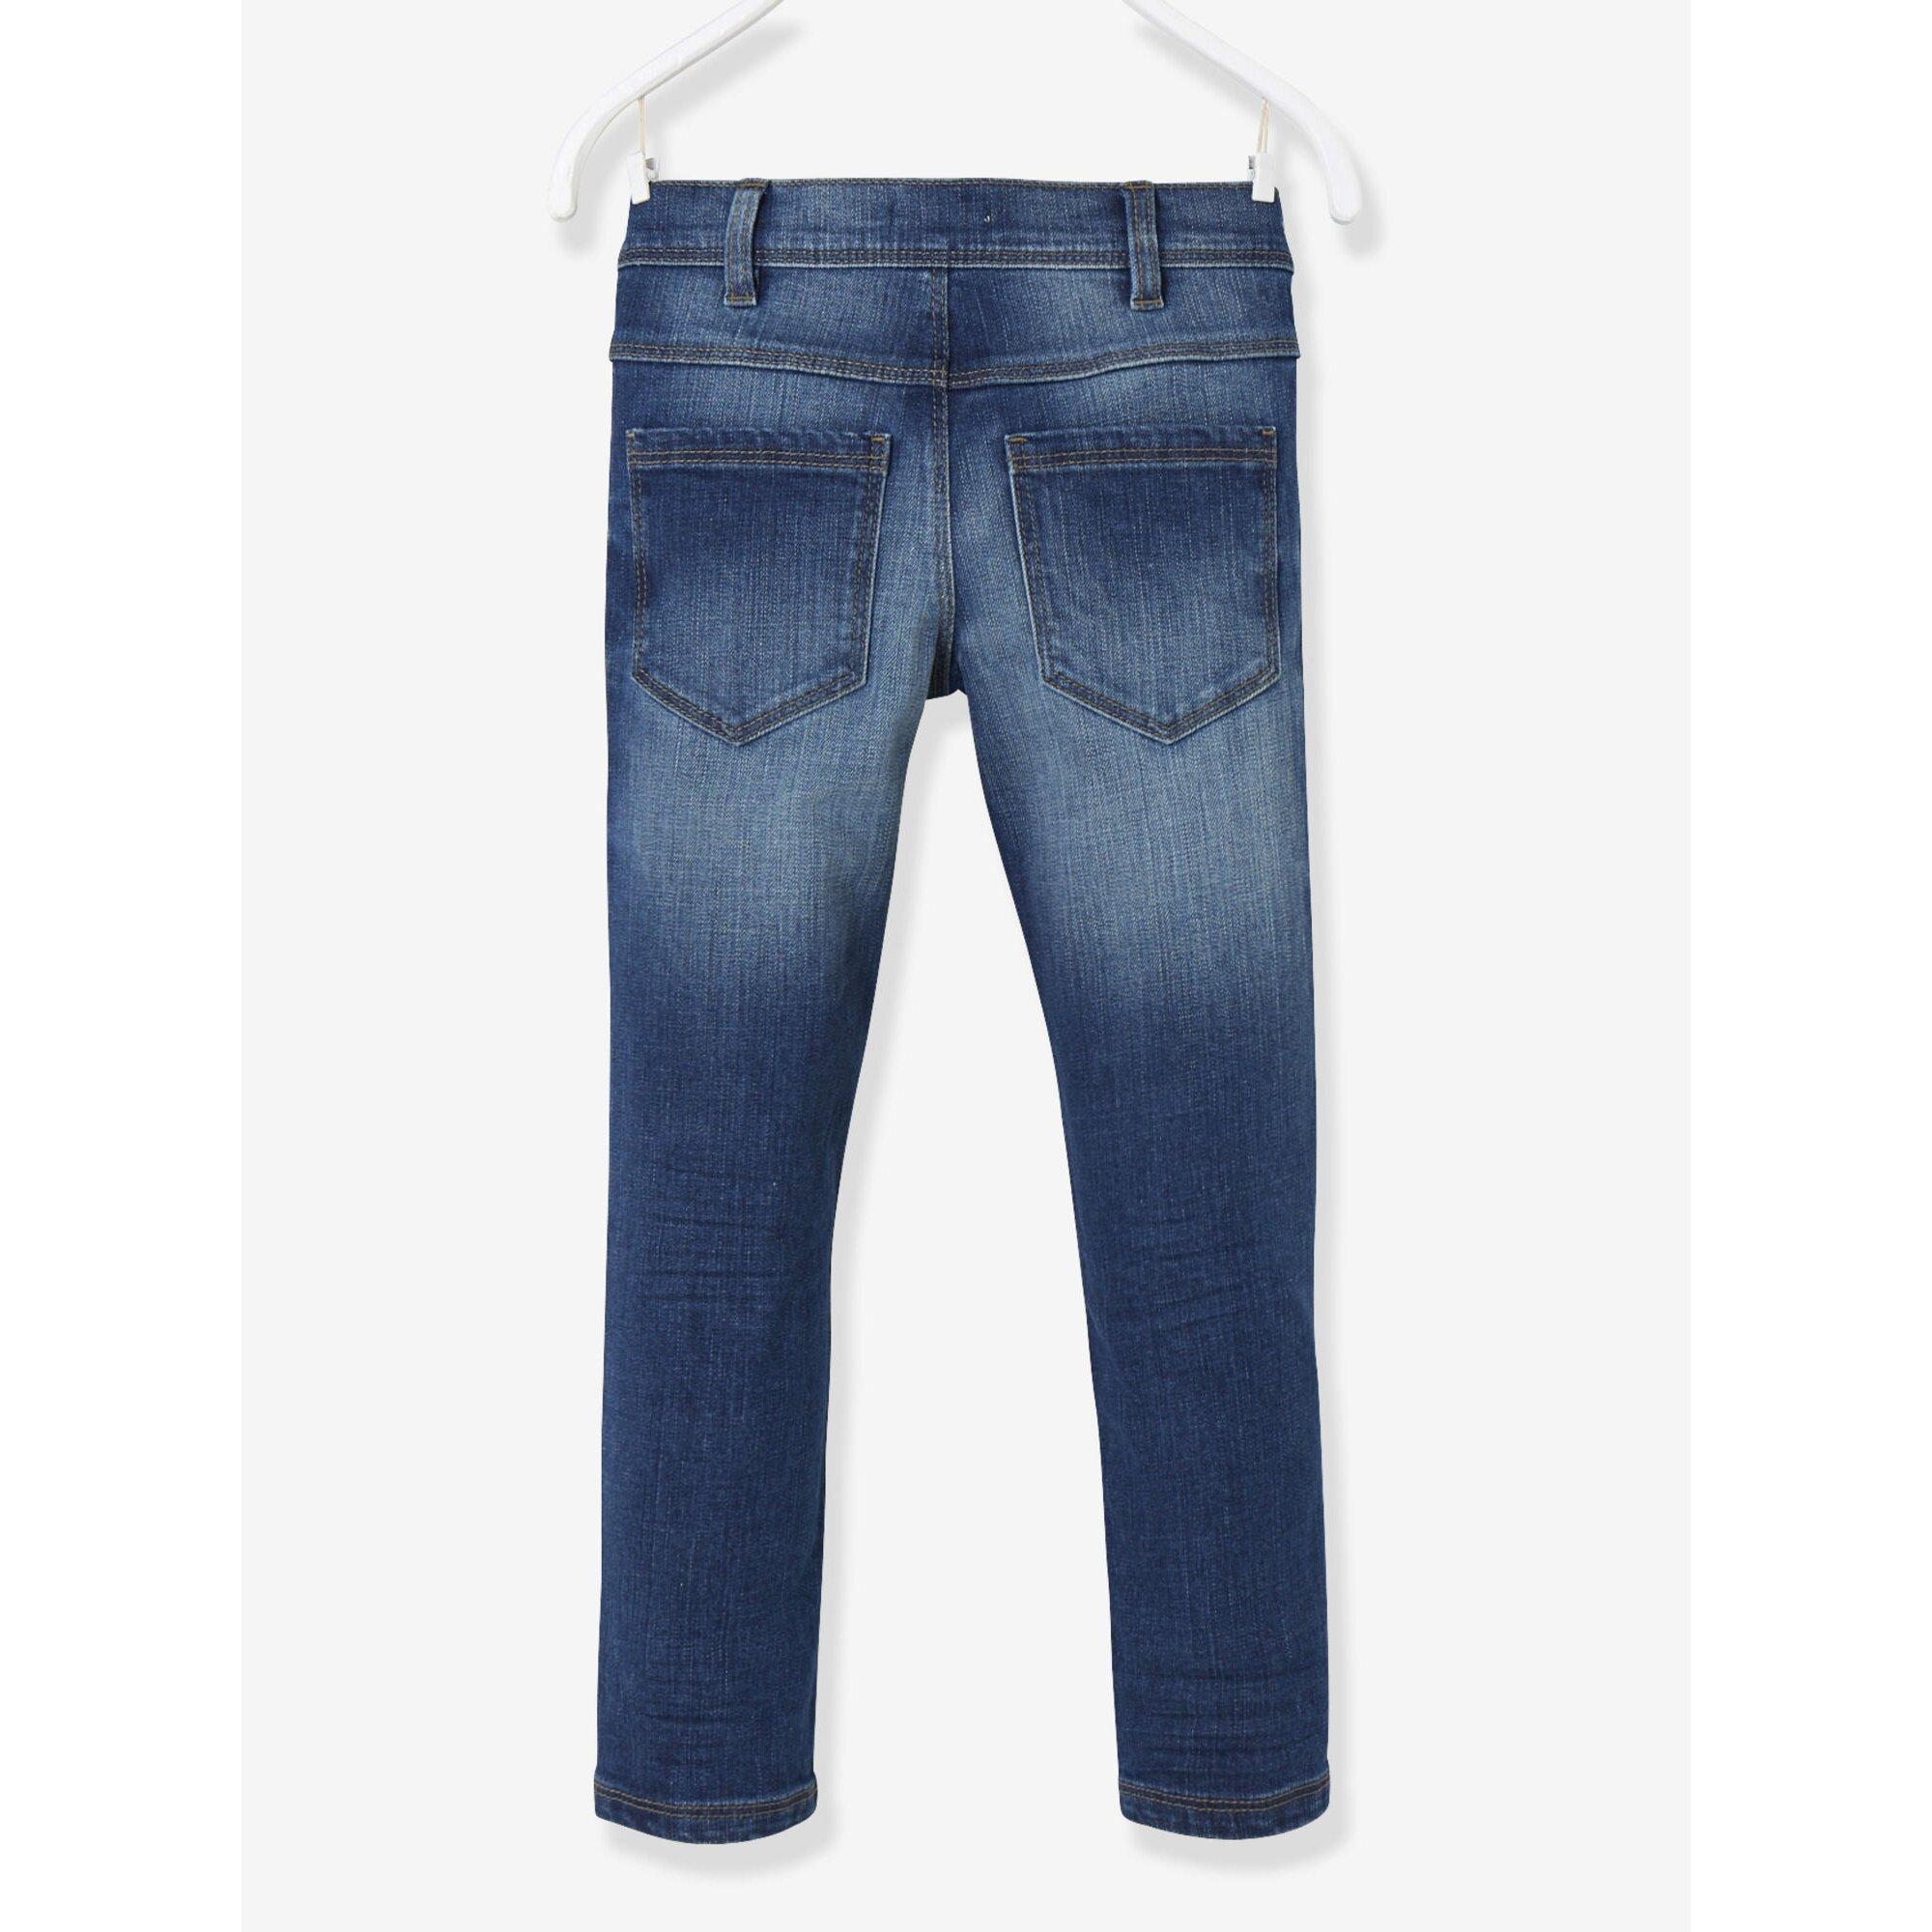 vertbaudet-jeans